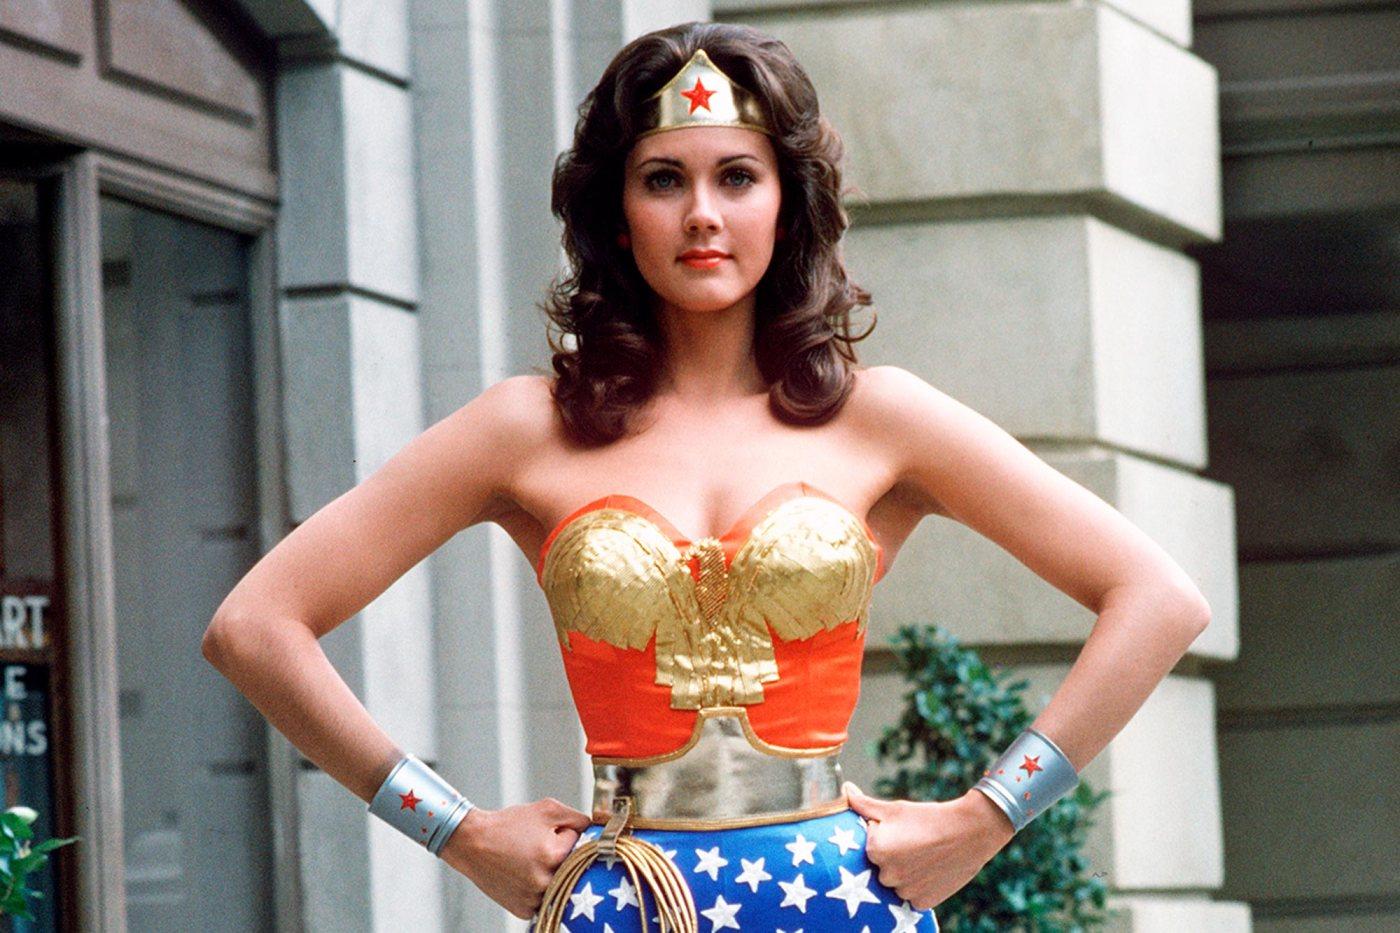 WONDER-WOMAN-The-New-Original-Wonder-Woman-pilot-Season-One-11-7-75-Based-on-Charles-Moulton-s-comic